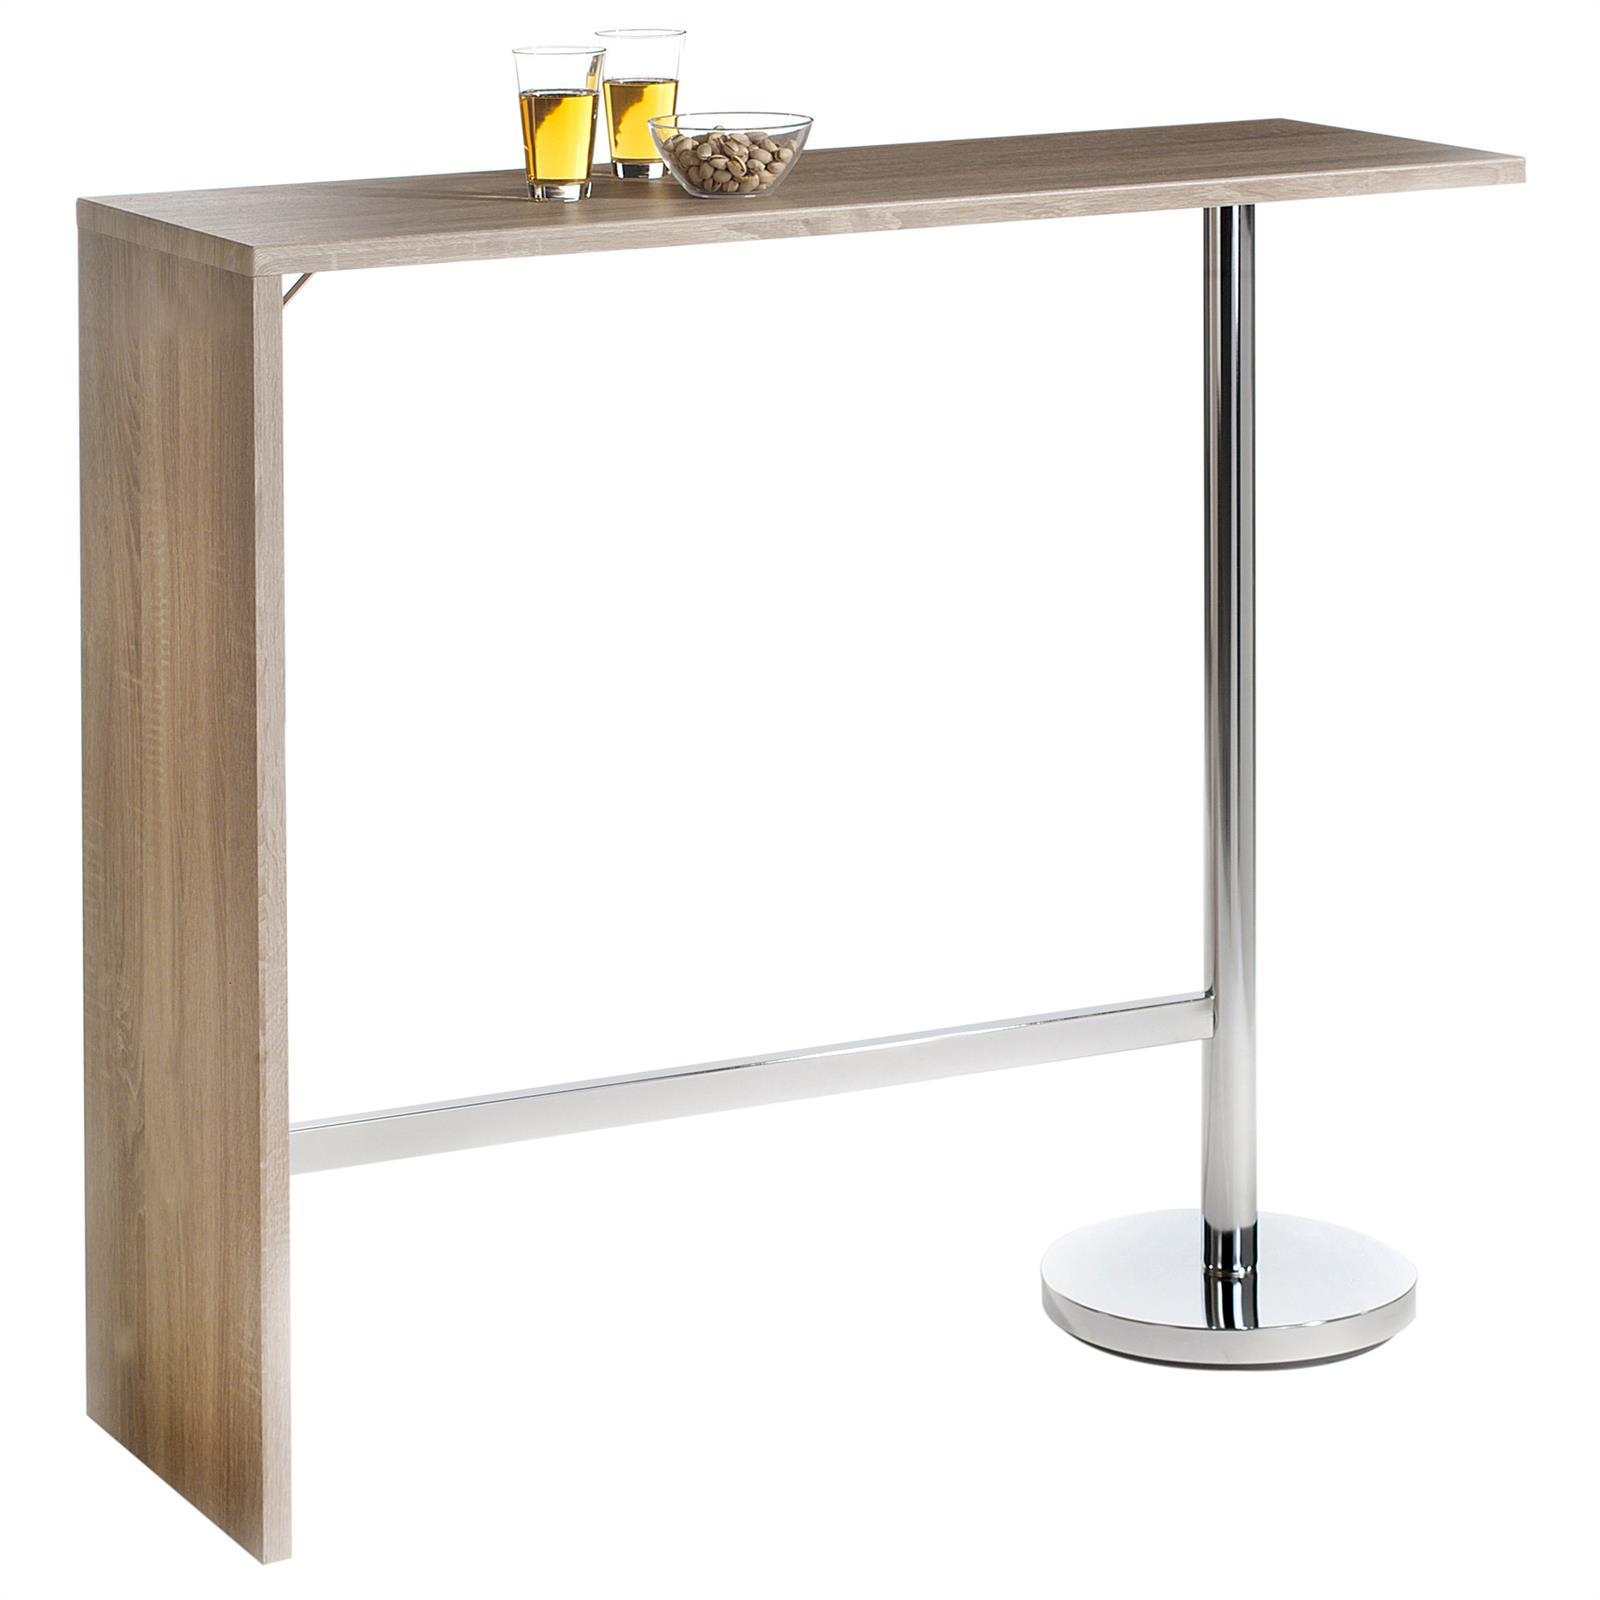 table haute de bar mange debout mdf 3 coloris disponibles ebay. Black Bedroom Furniture Sets. Home Design Ideas